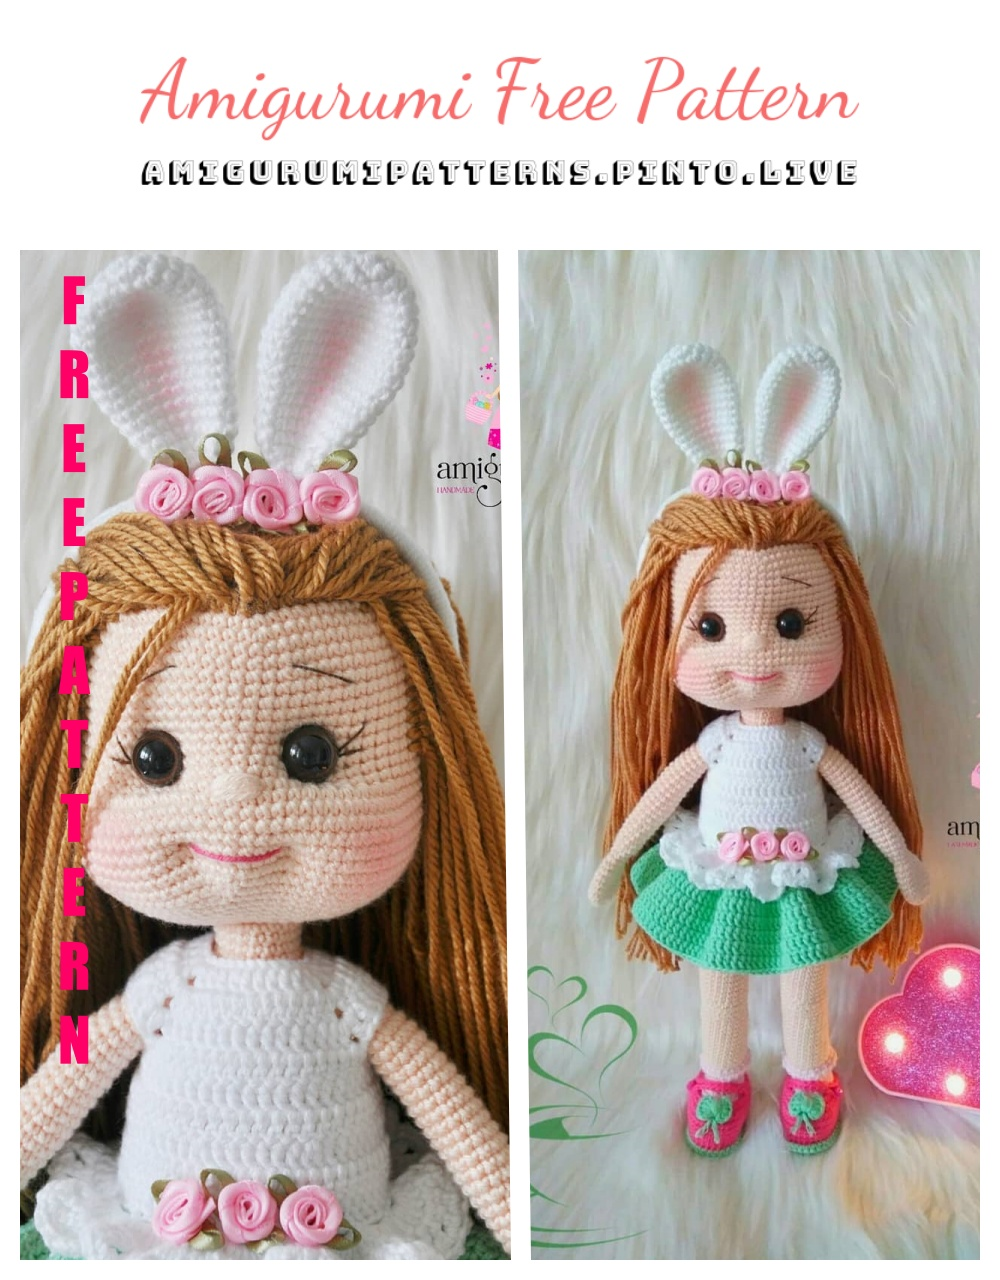 Ateliê Maria Rê - Aprenda a fazer Bonecas de Amigurumi | Facebook | 1280x1000